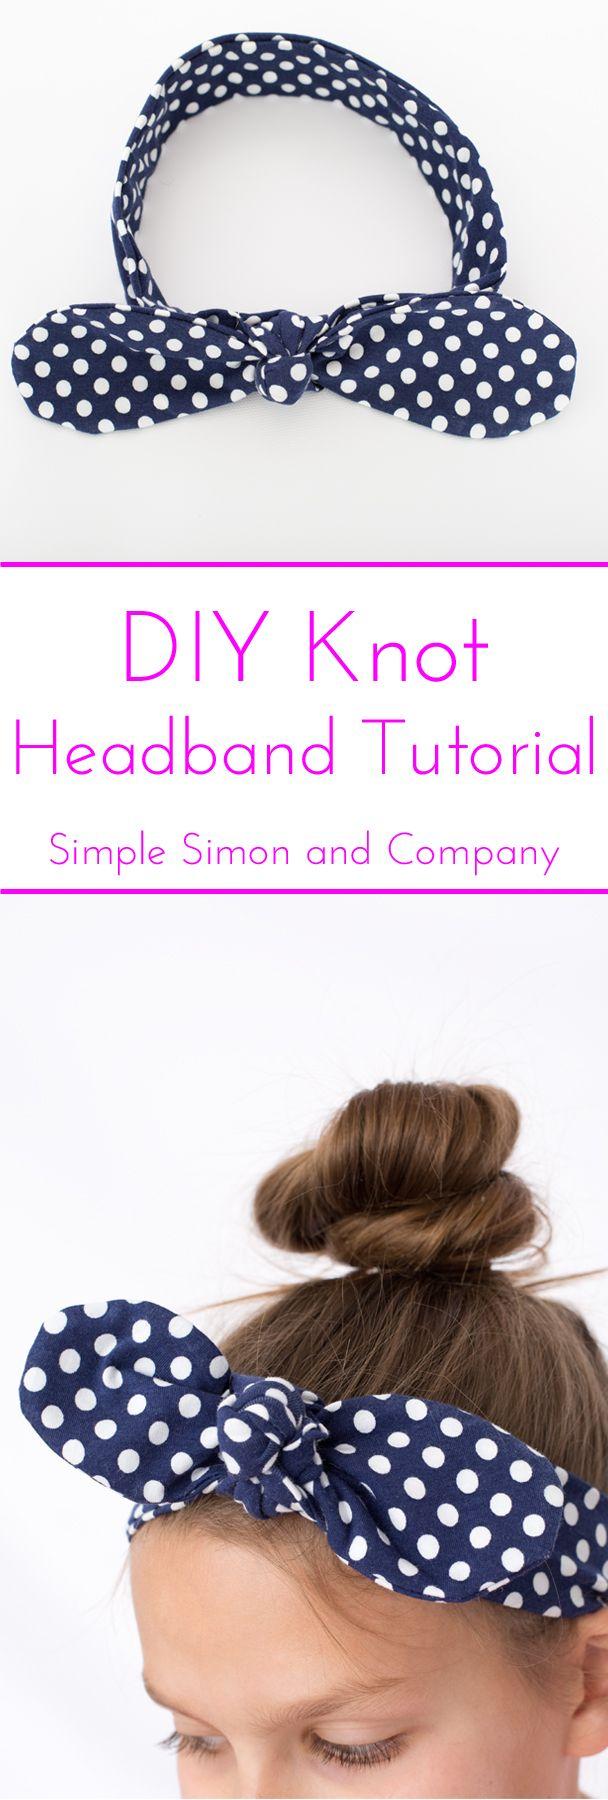 DIY Knot Headband Tutorial - Simple Simon and Company